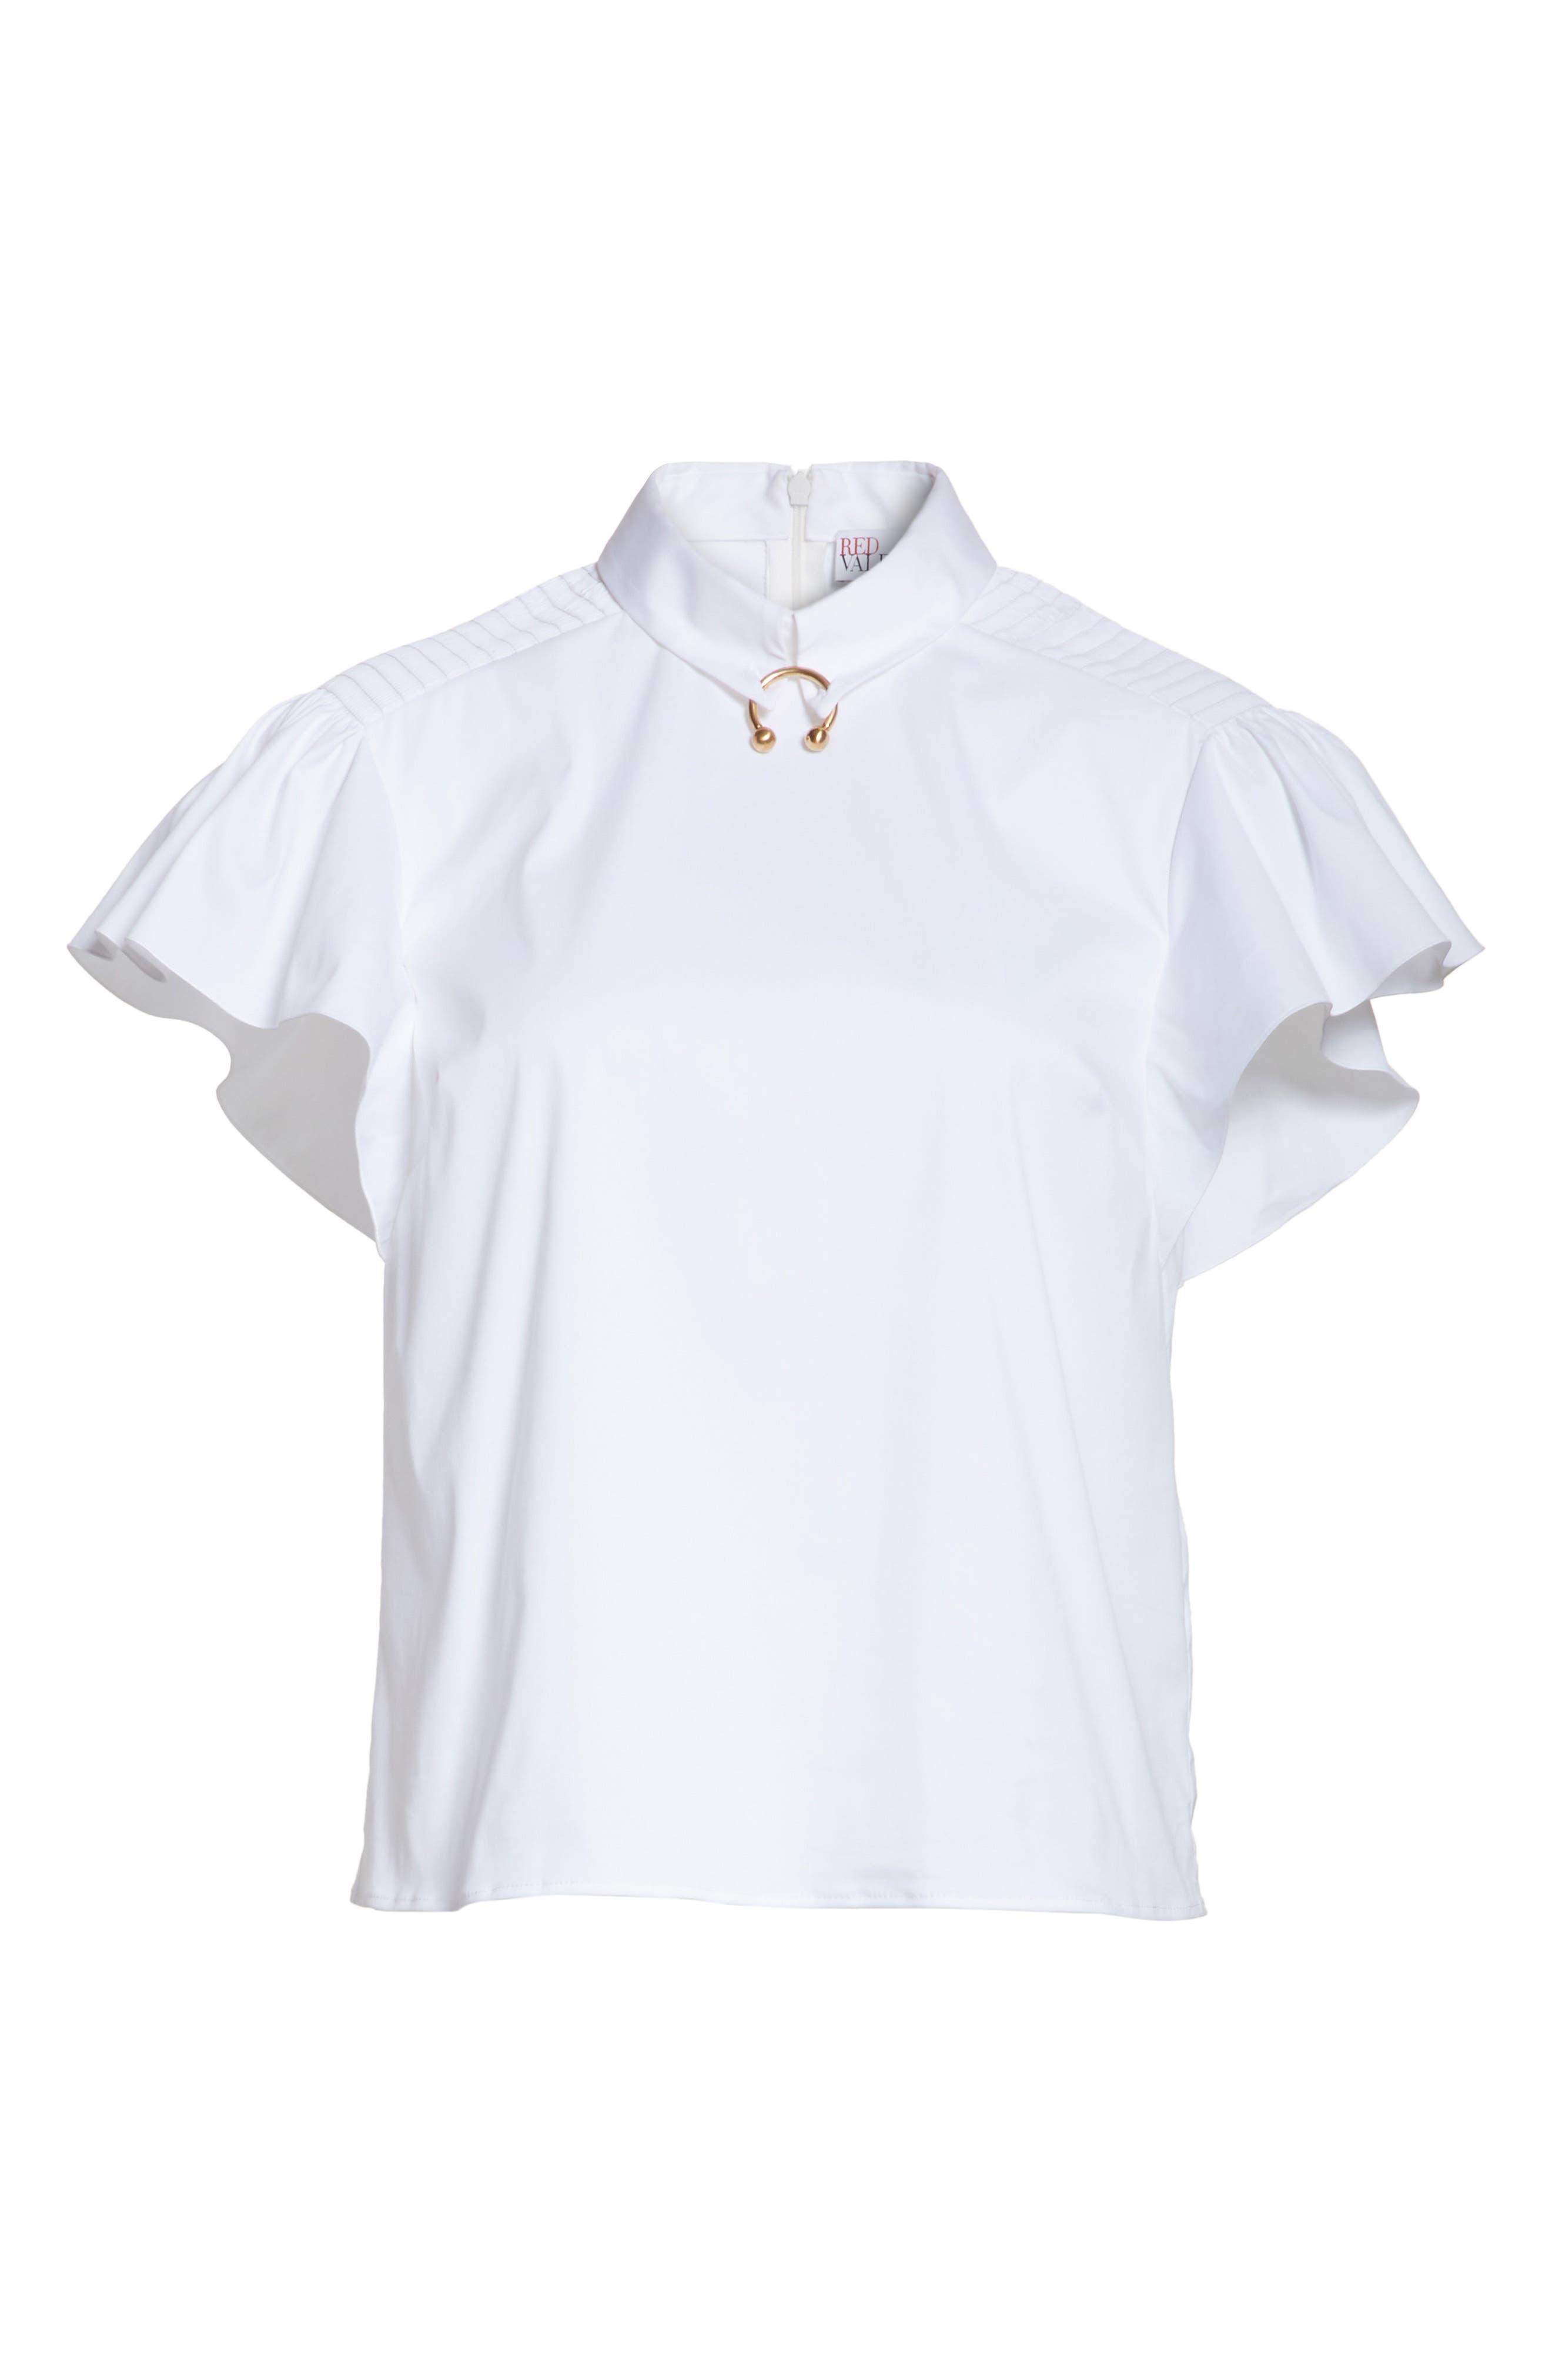 Pierced Cotton Poplin Shirt,                             Alternate thumbnail 6, color,                             100